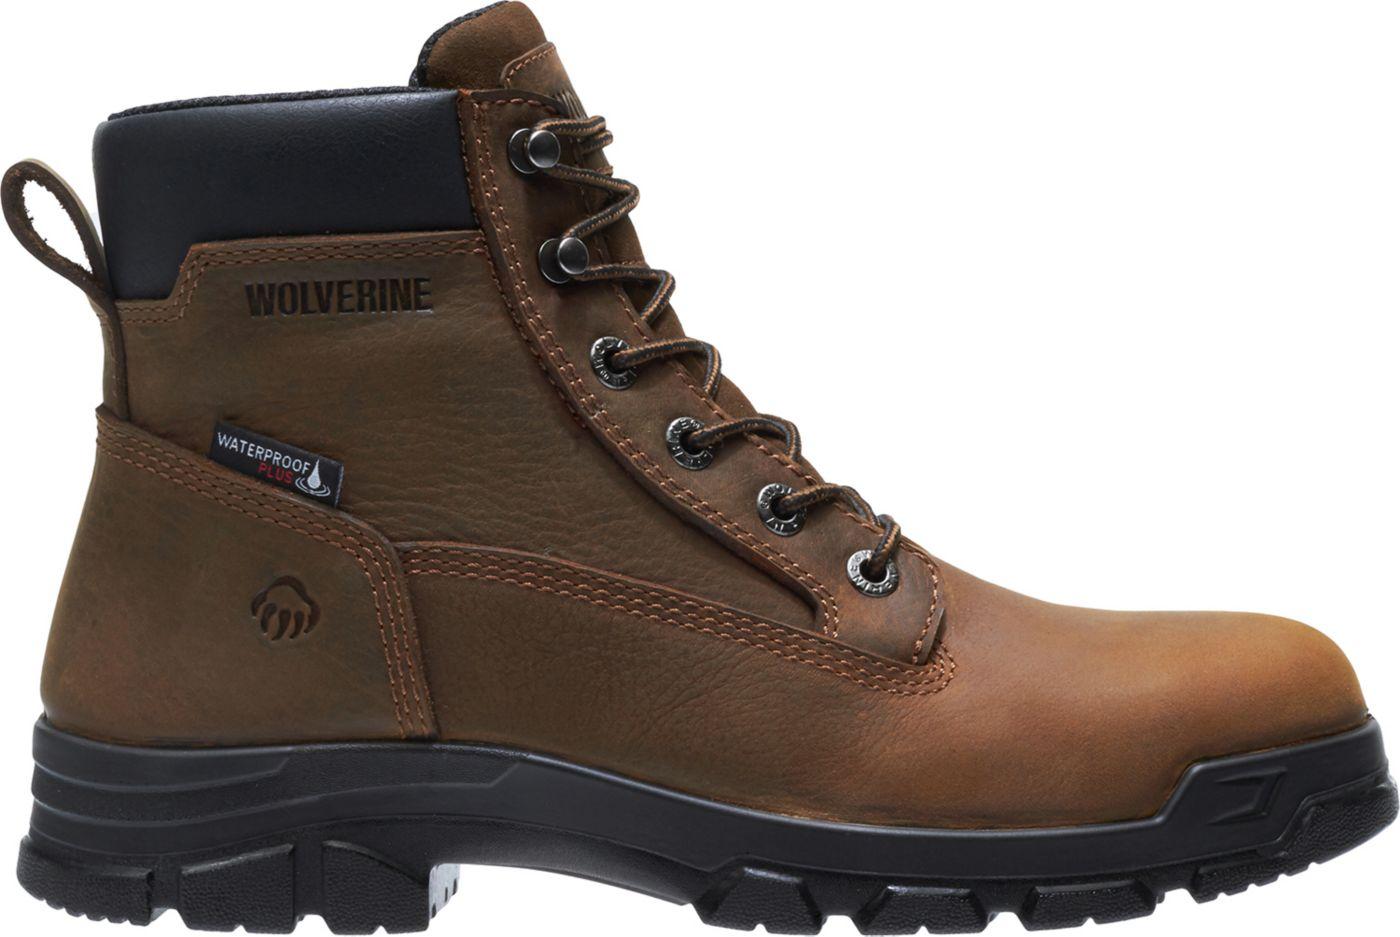 Wolverine Men's Chainhand EPX 6'' Steel Toe Waterproof Work Boots